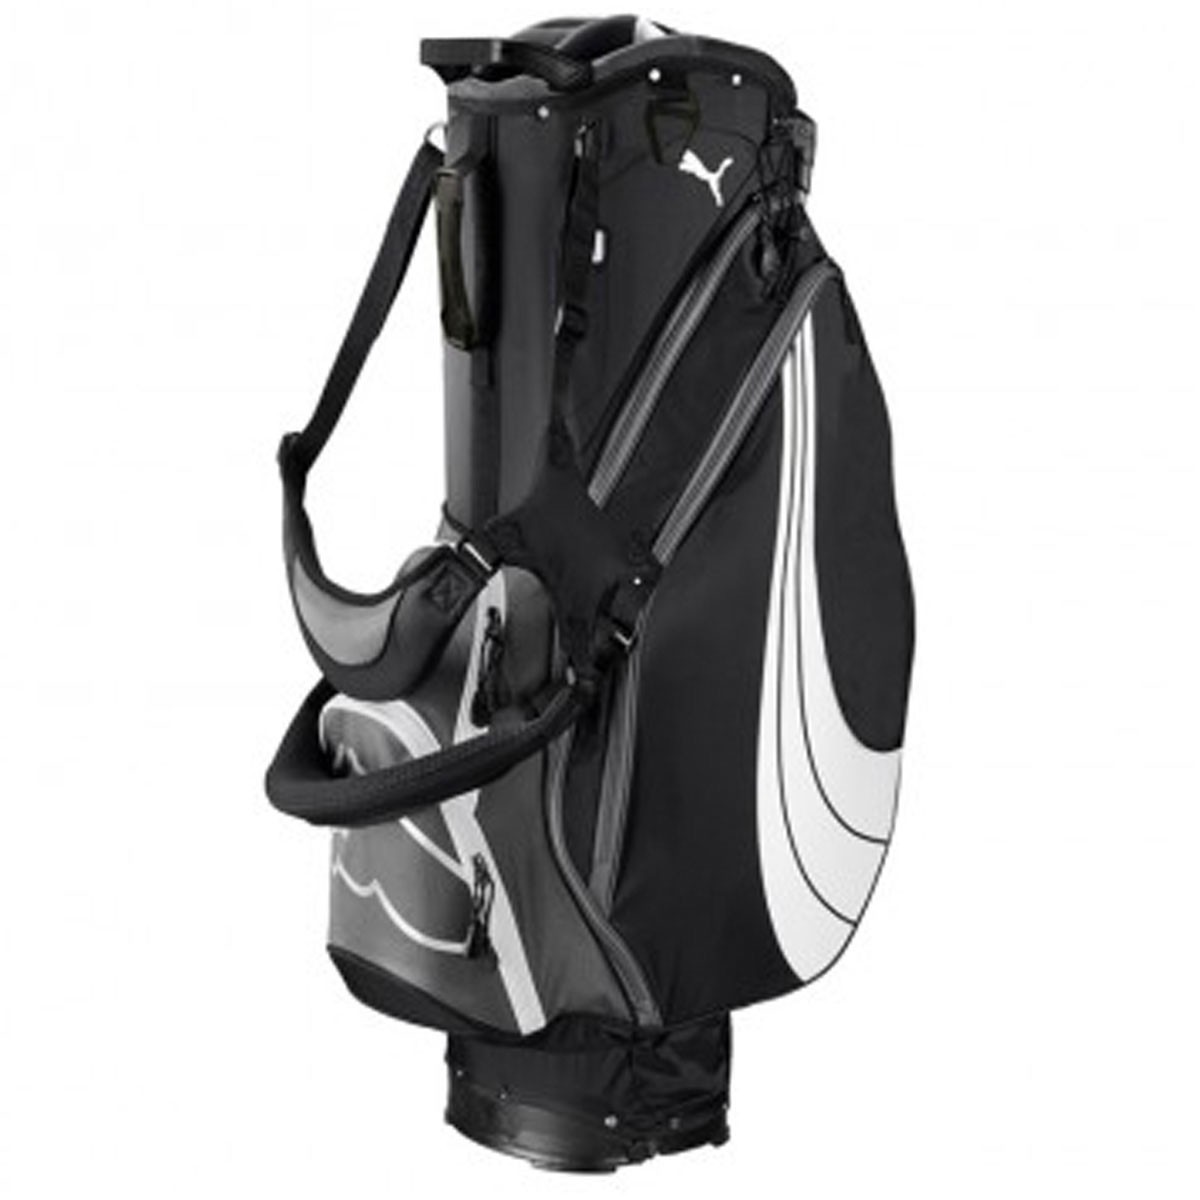 8dfc3983a1 Puma Golf Formstripe 2.0 Stand Carry Bag - 8 Way Divider - Golf